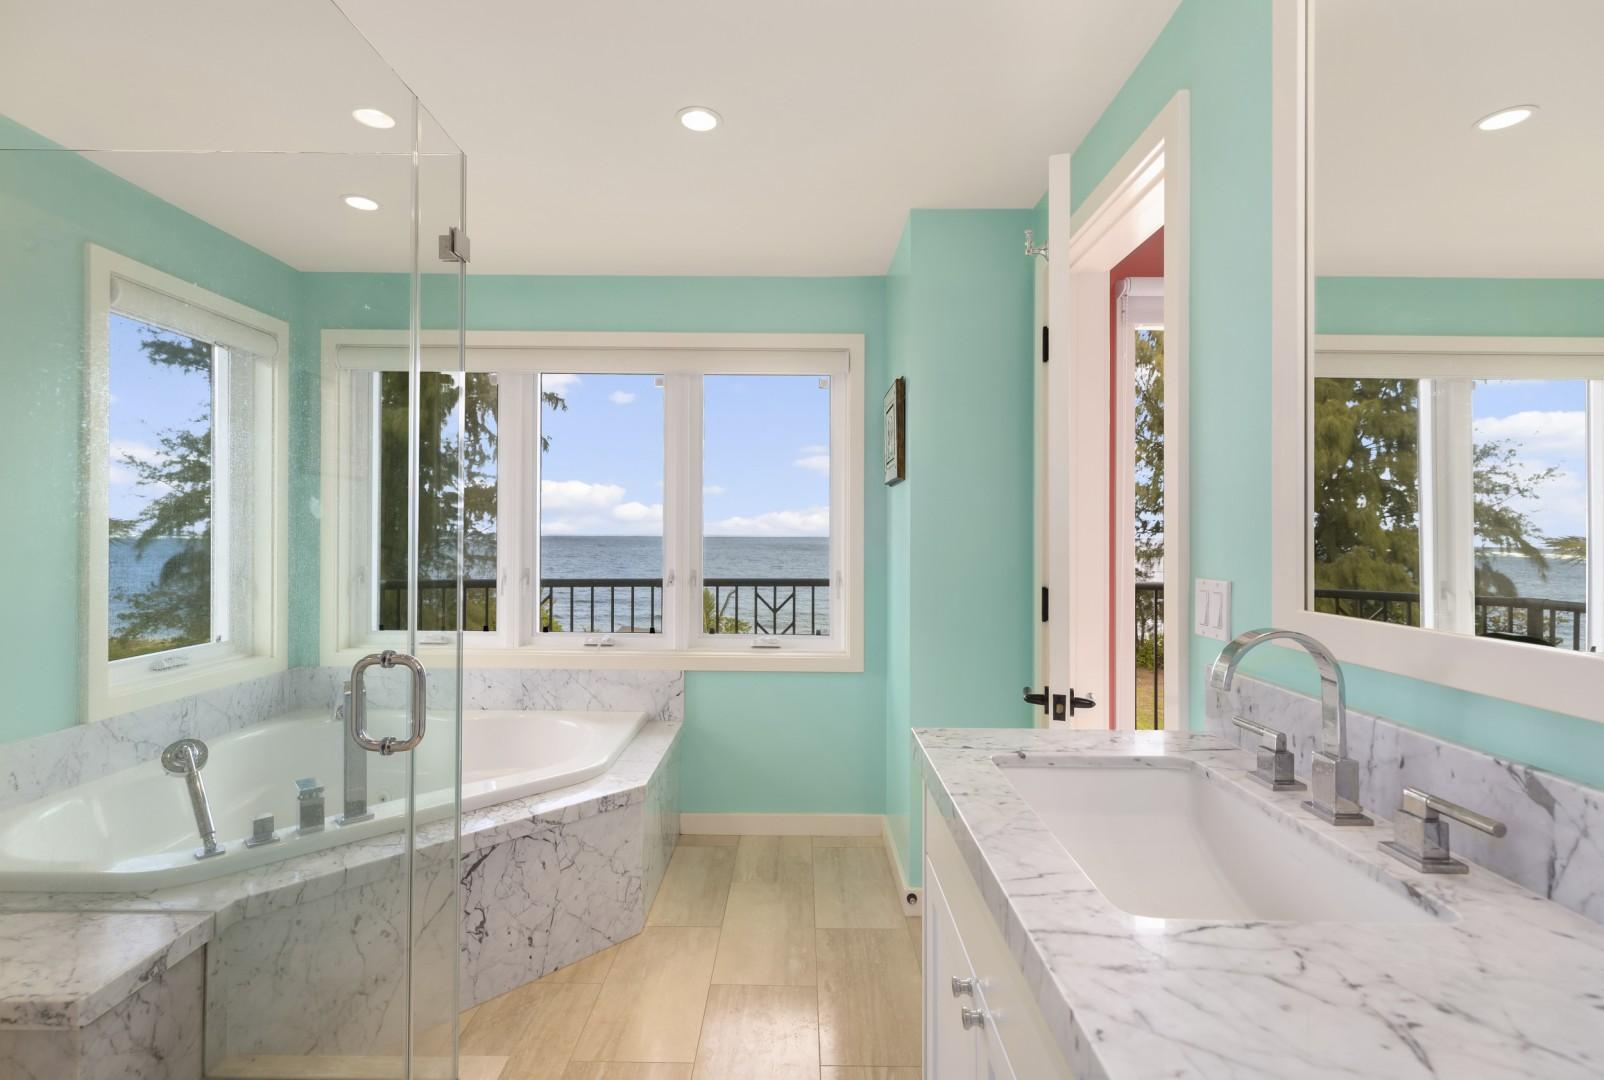 Second bedroom en suite bath, with whirlpool tub.